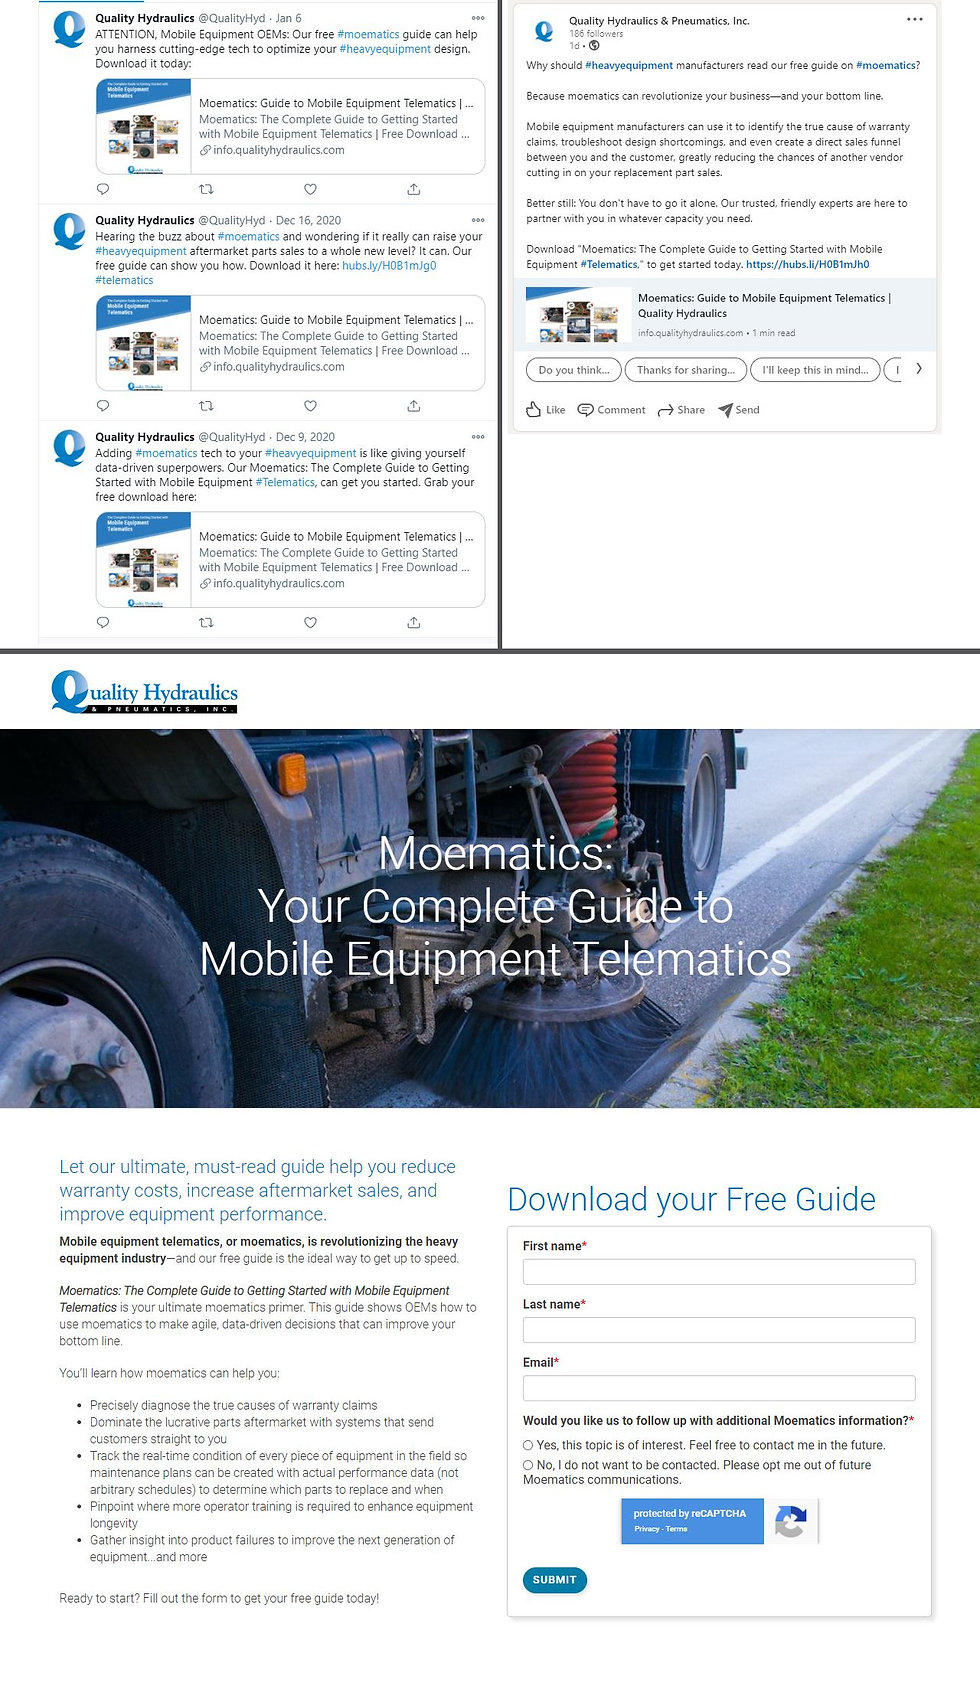 Moematics_content - Quality Hydraulics.j